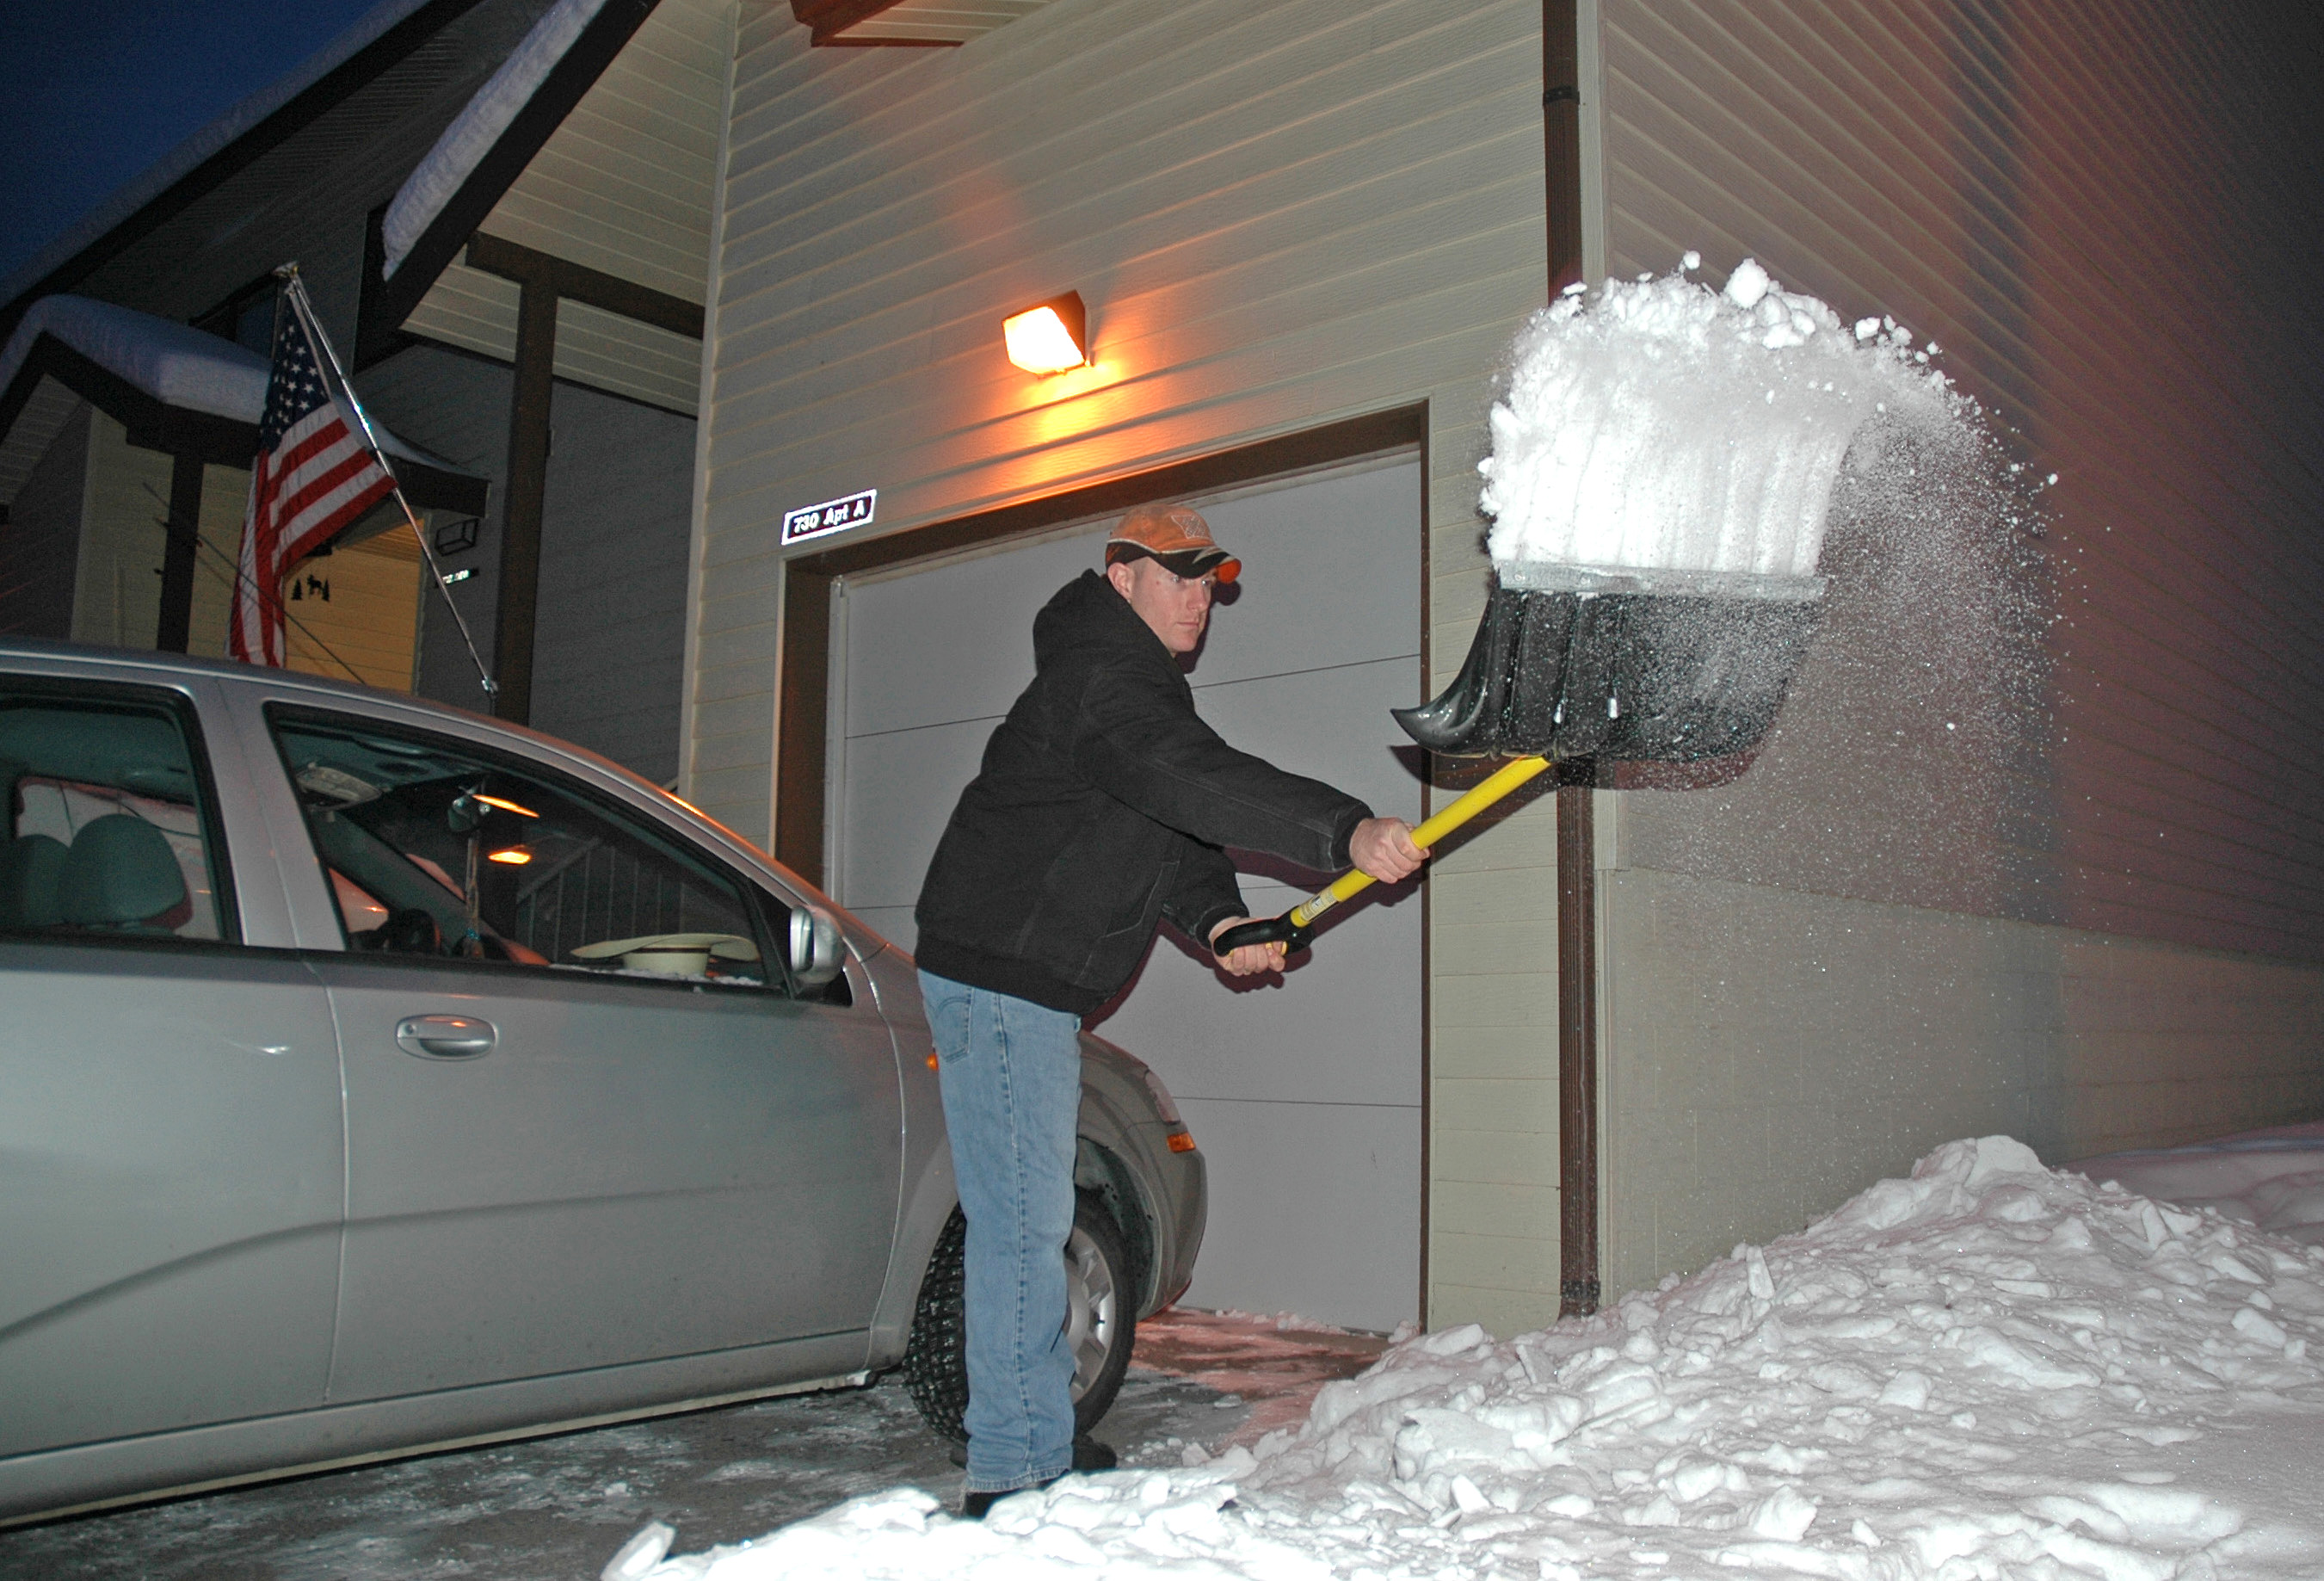 Best Snow Shovels for Cars